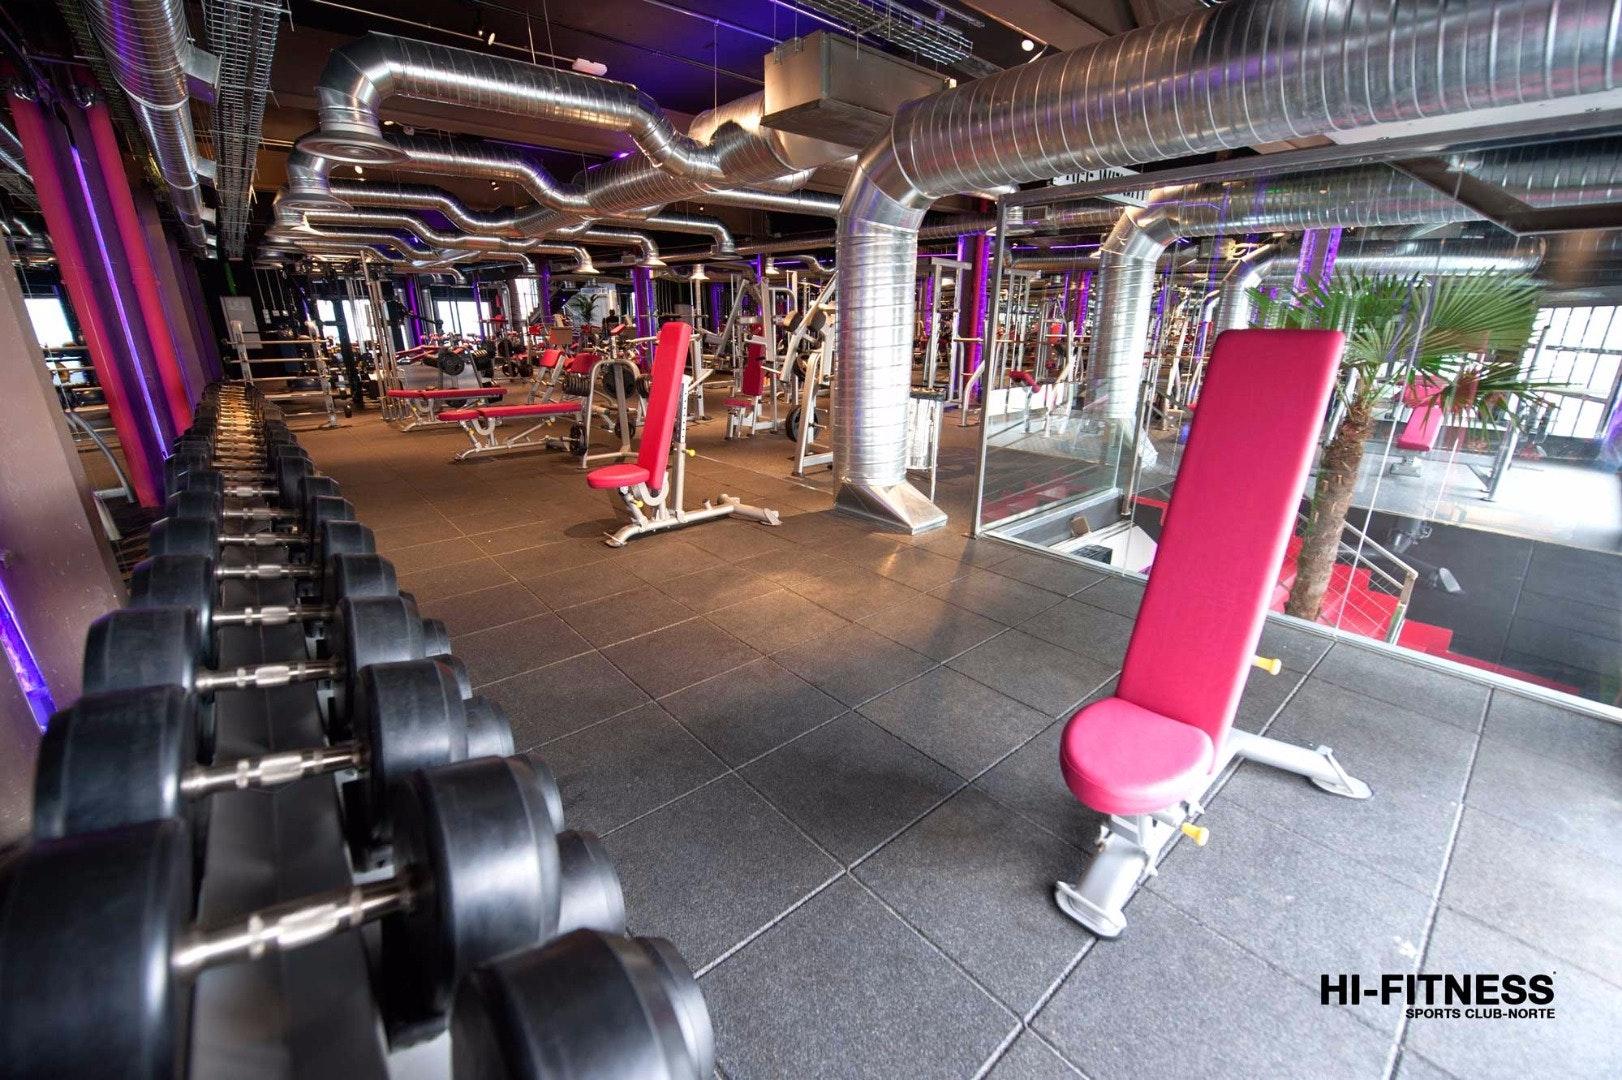 Foto 1 Oferta Gimnasio Hi fitness Norte Madrid - GymForLess